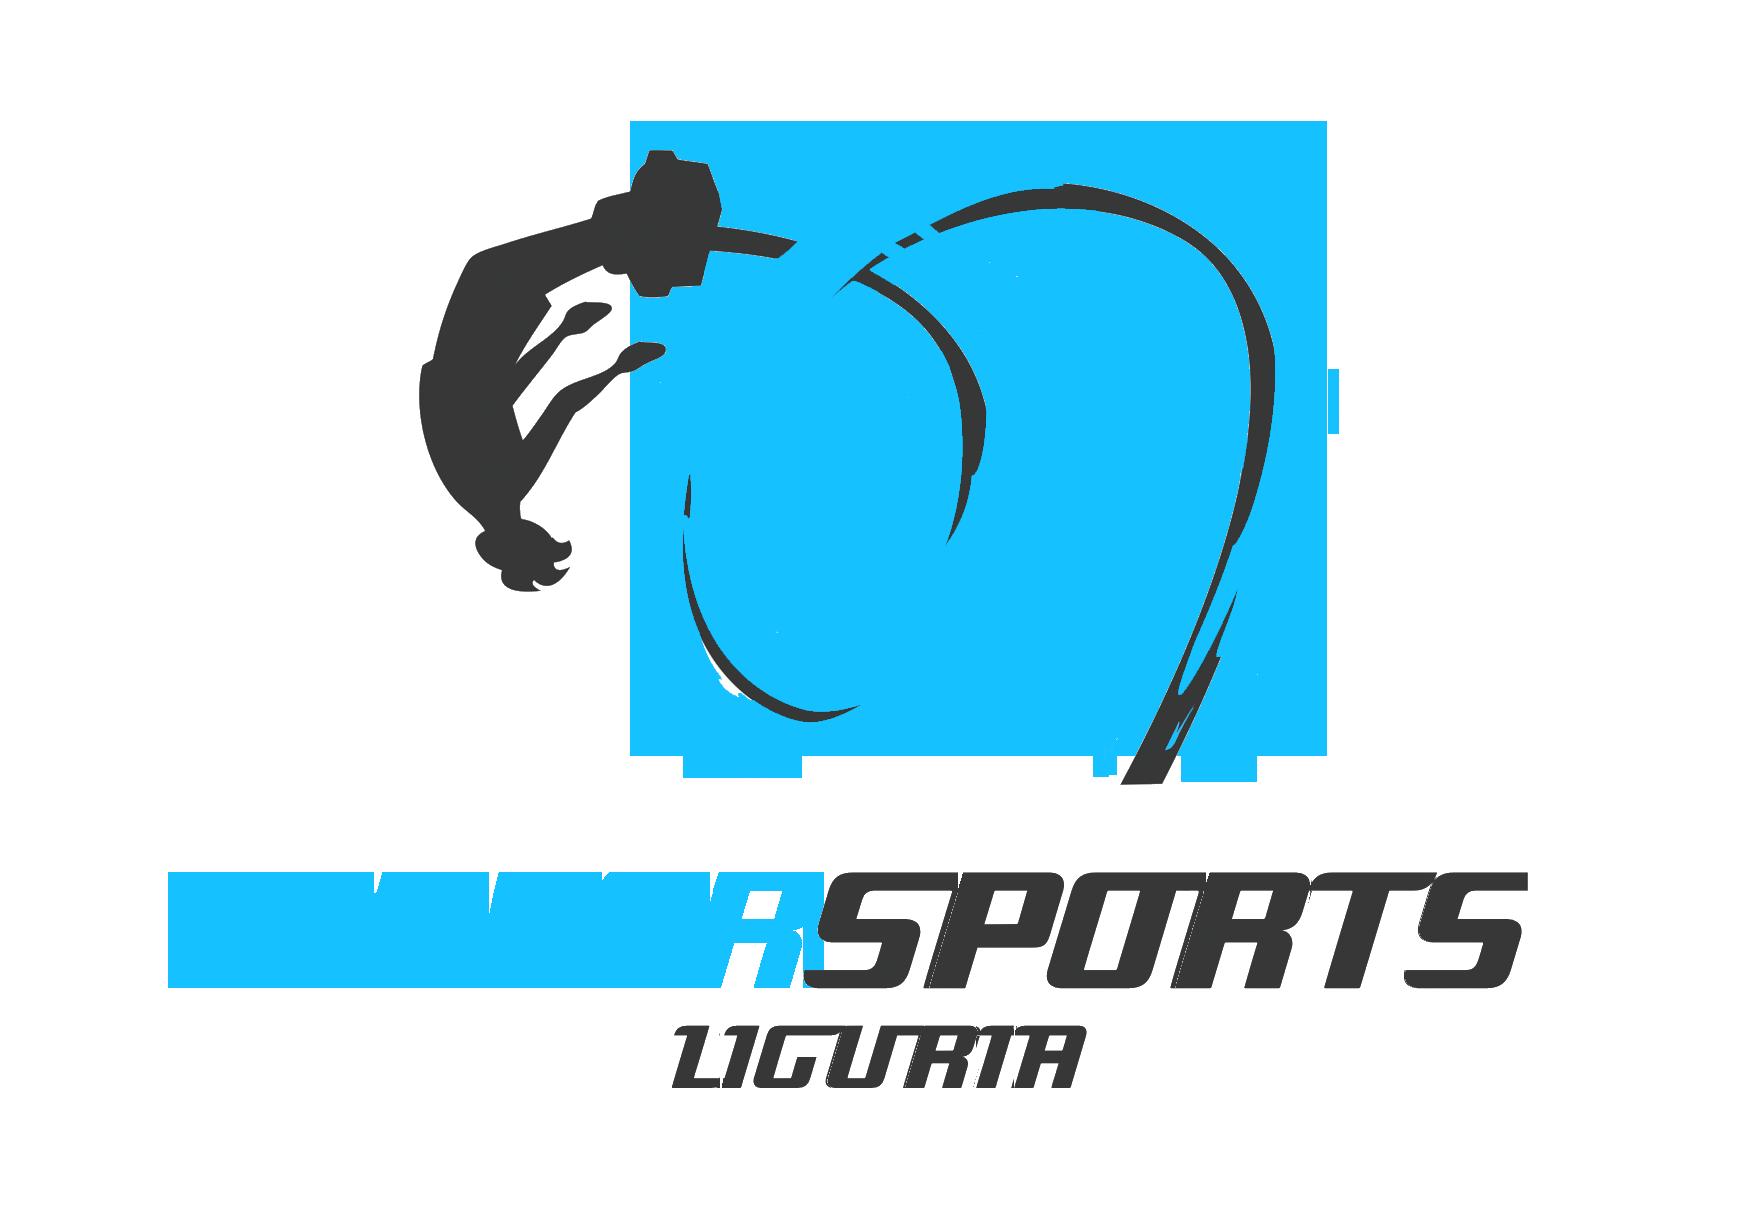 Water Sports Liguria